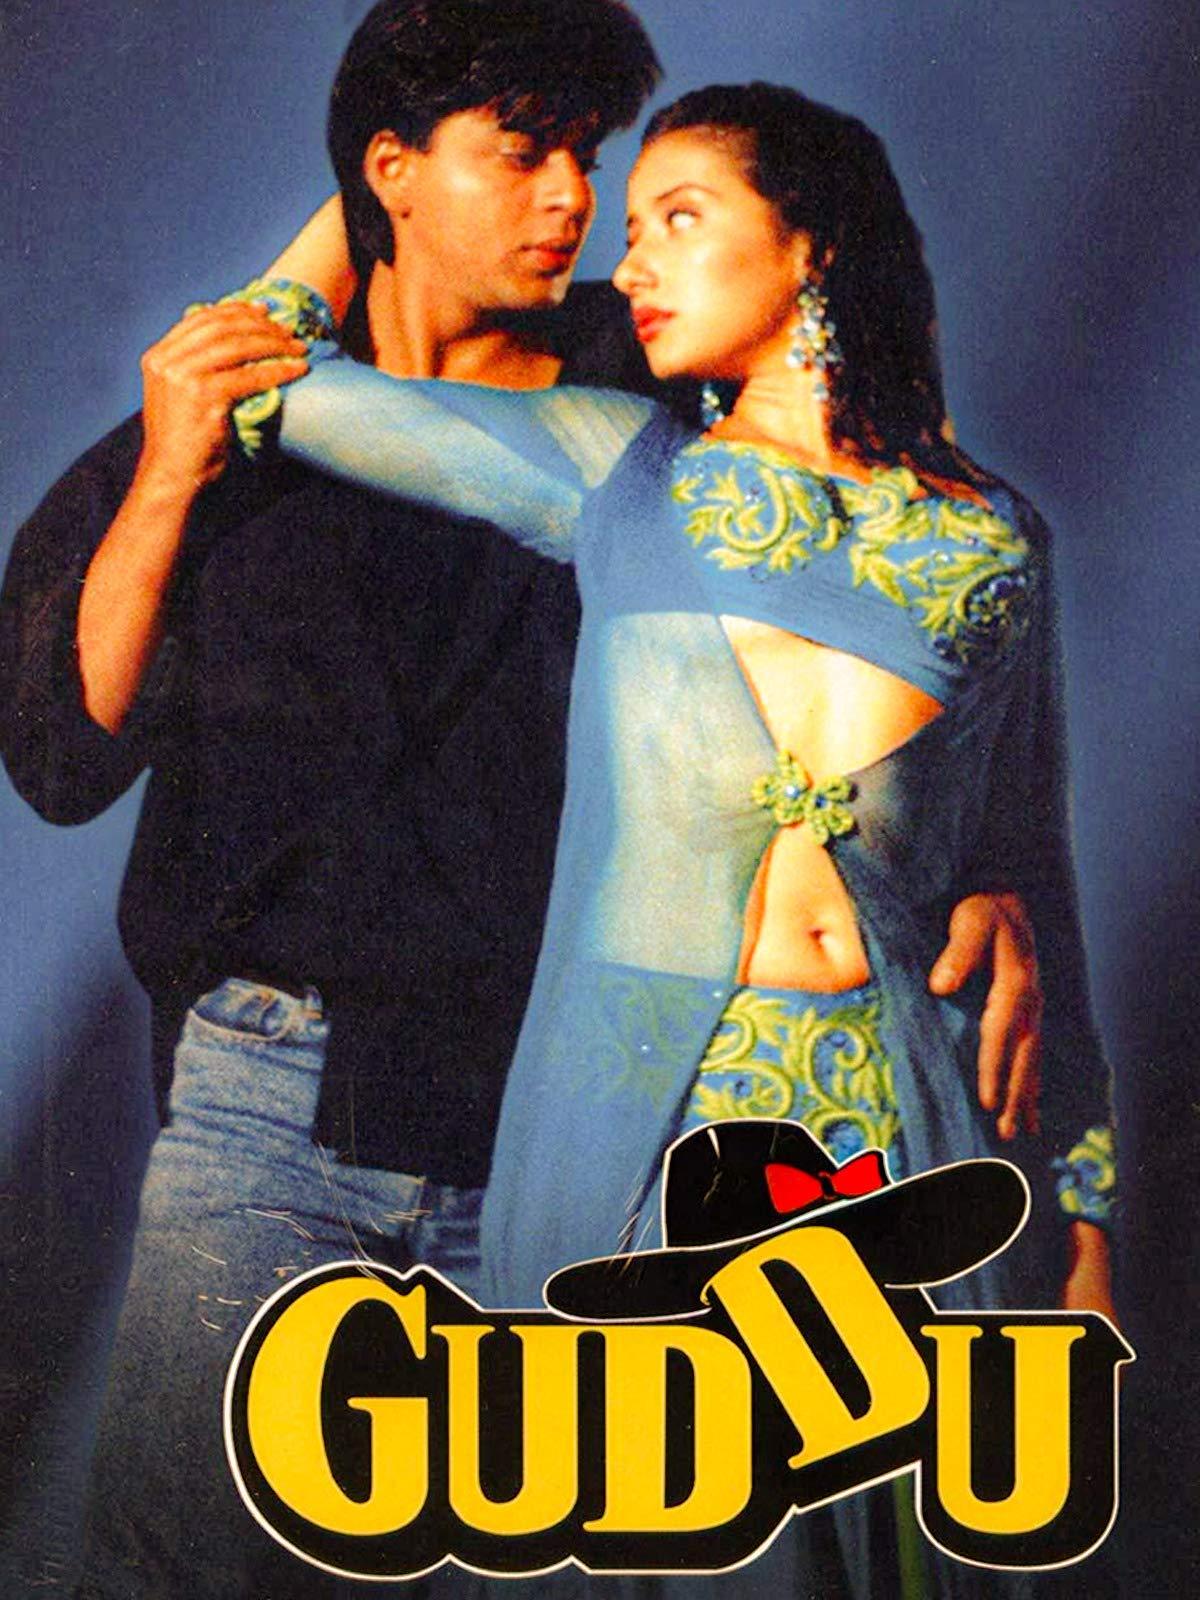 Amazon.com: Watch Guddu | Prime Video